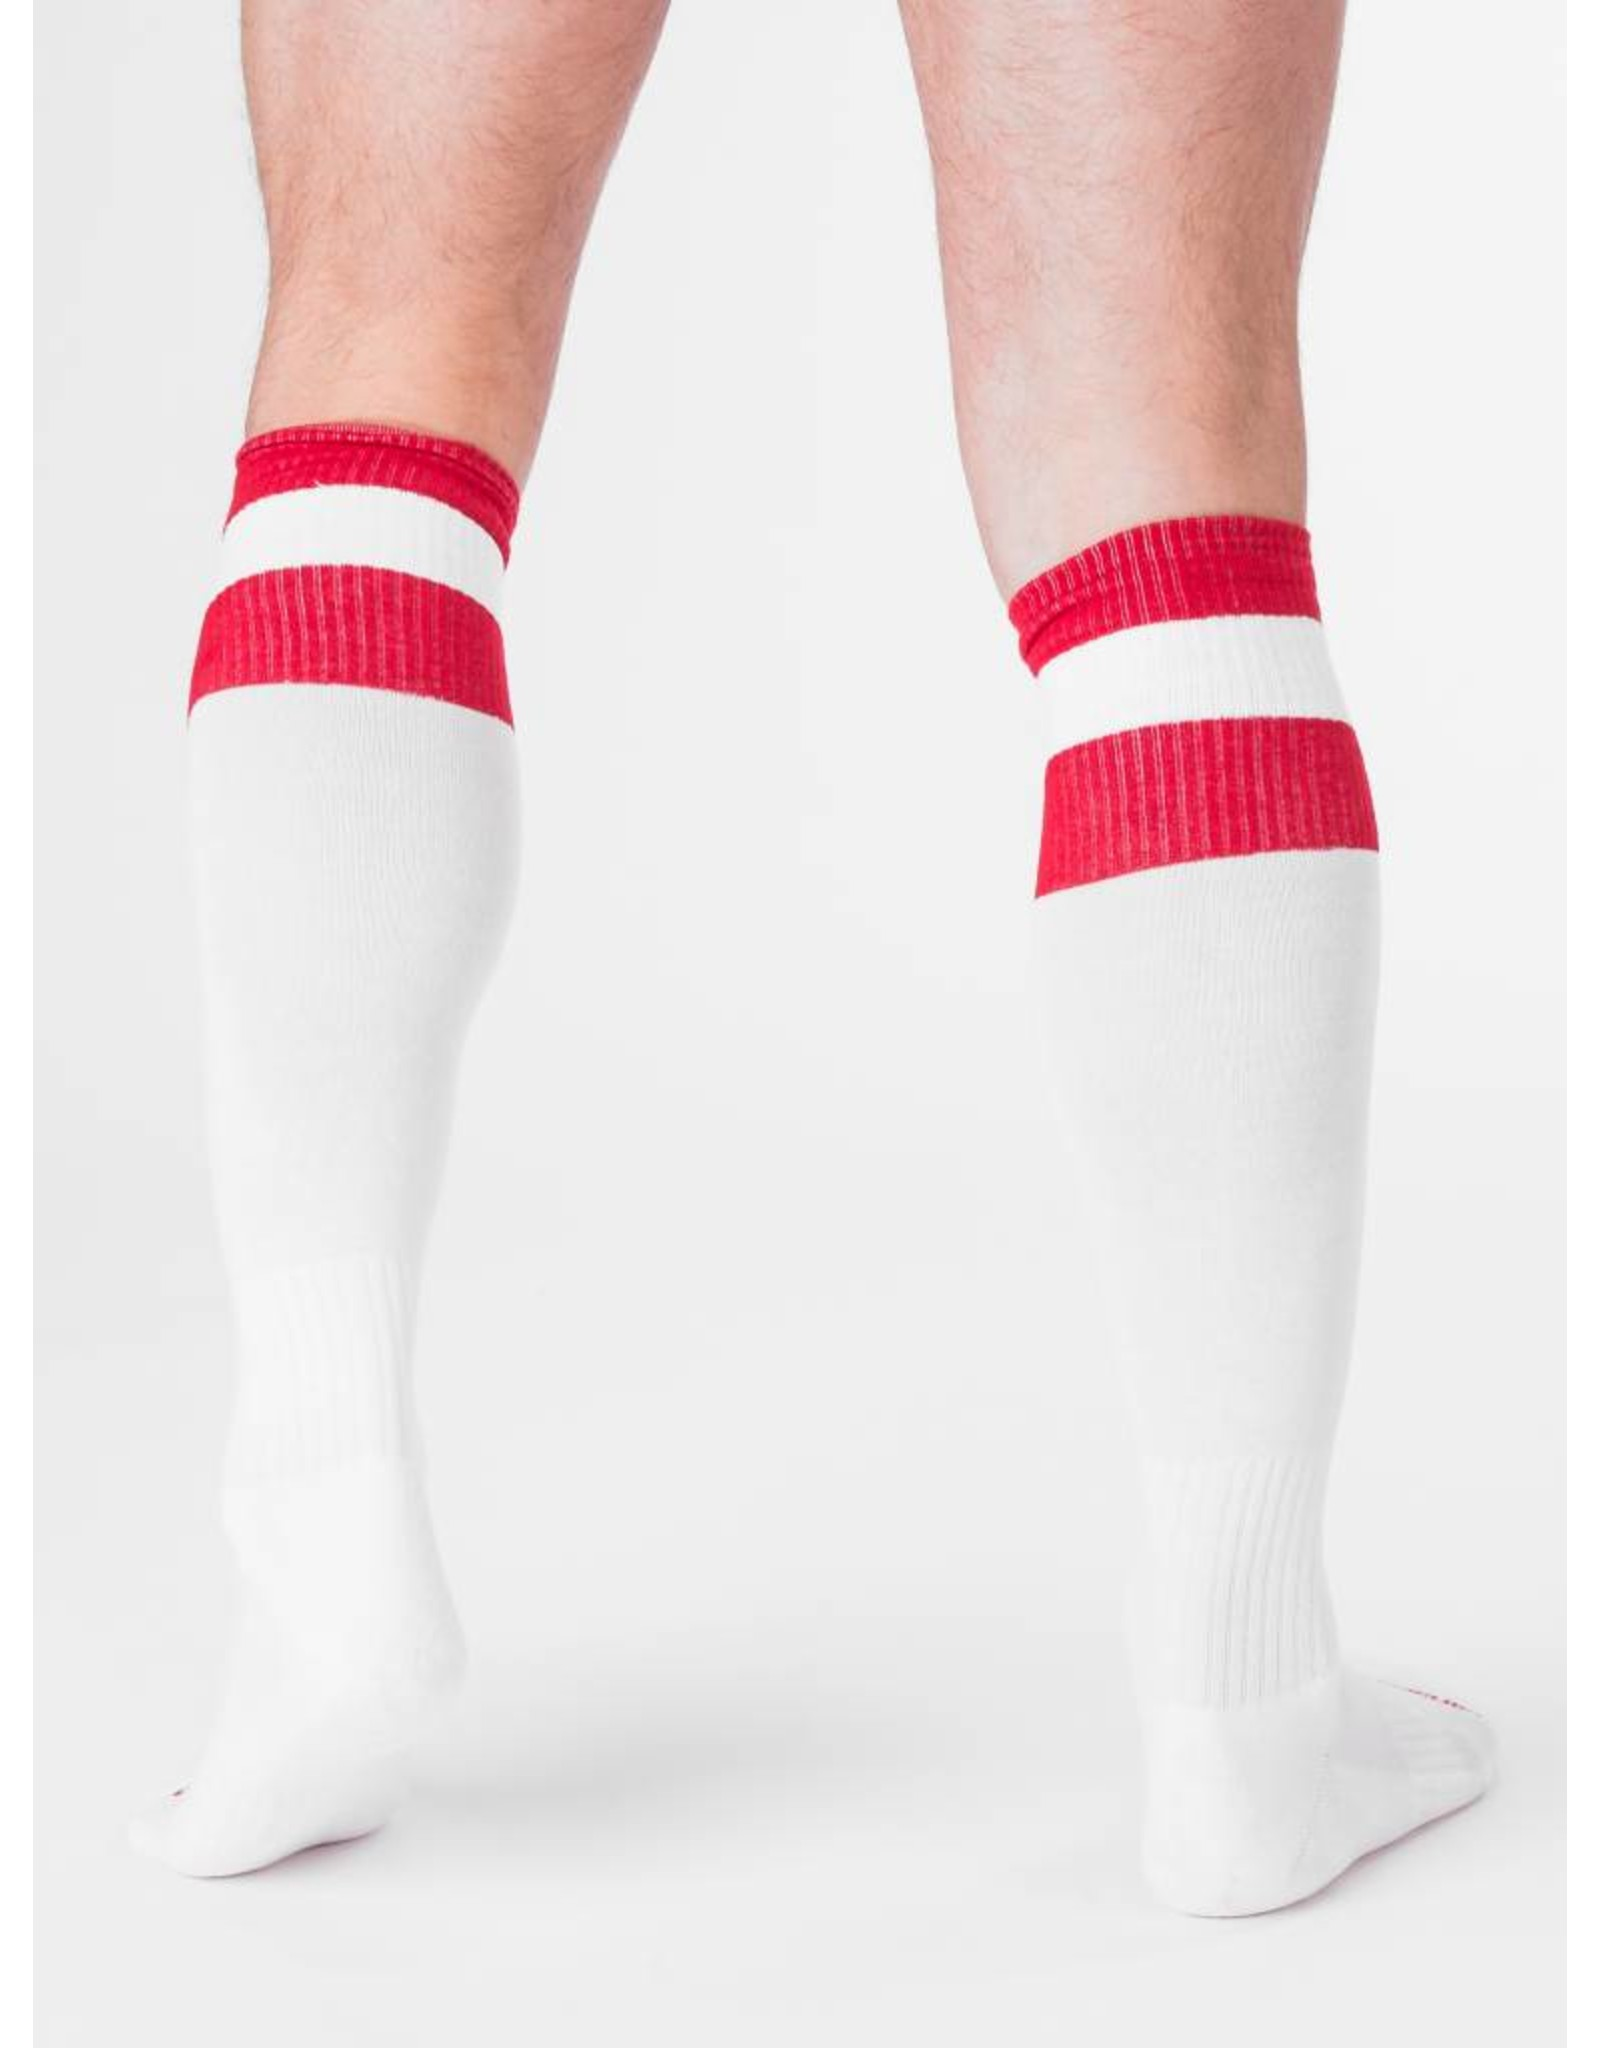 Barcode Berlin Barcode Berlin Football Socks blanc- rouge